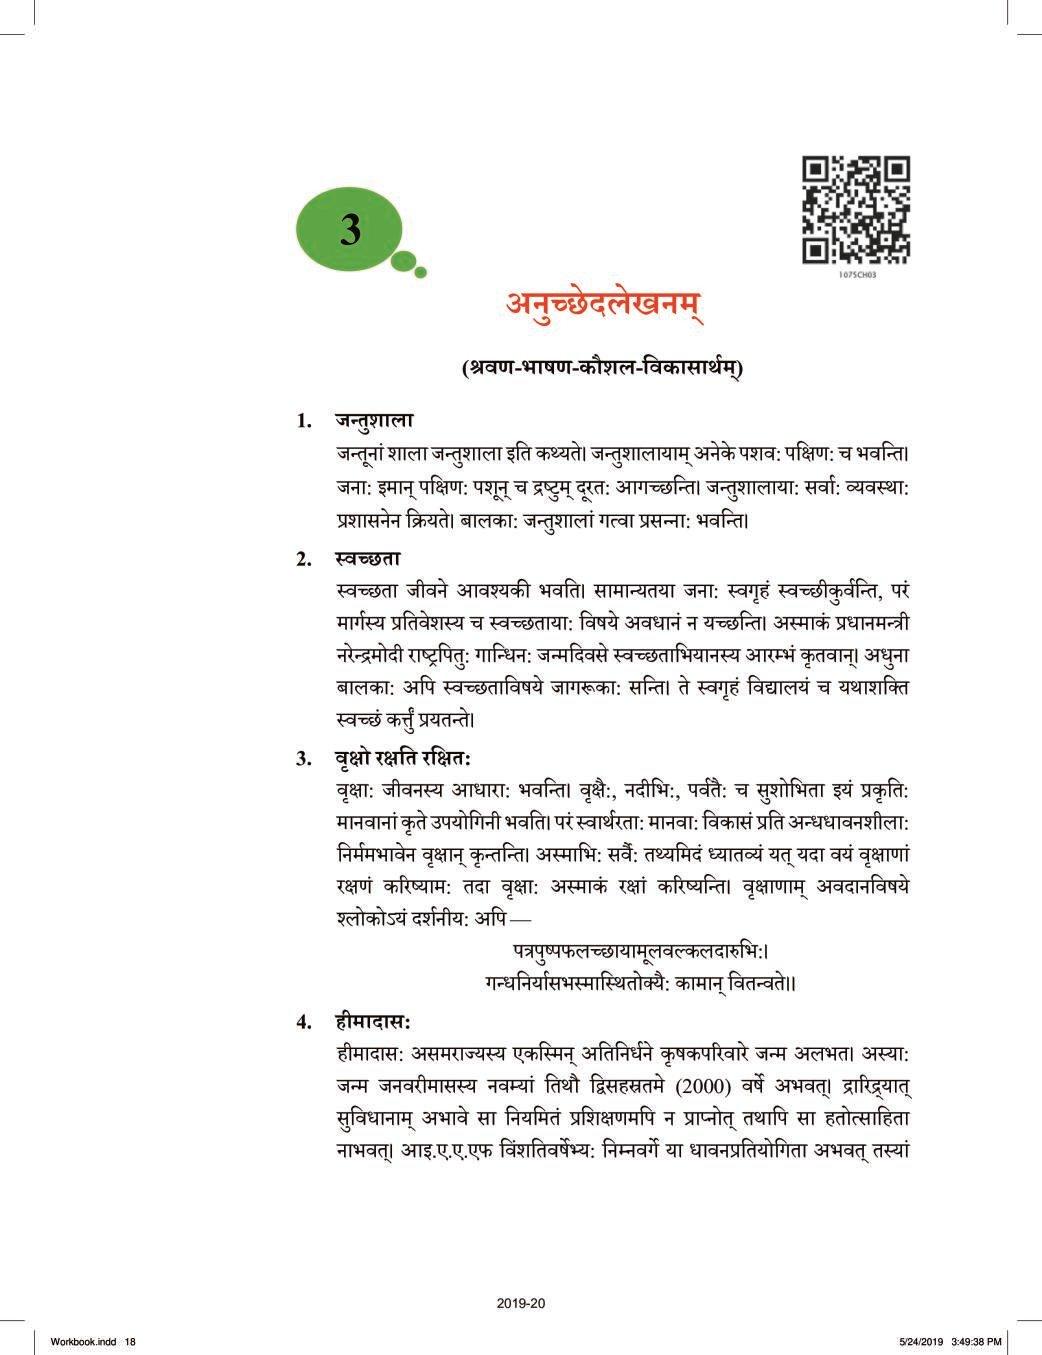 NCERT Book Class 10 Sanskrit (अभ्यासवान् भव) Chapter 3 अनुच्छेदलेखनम - Page 1